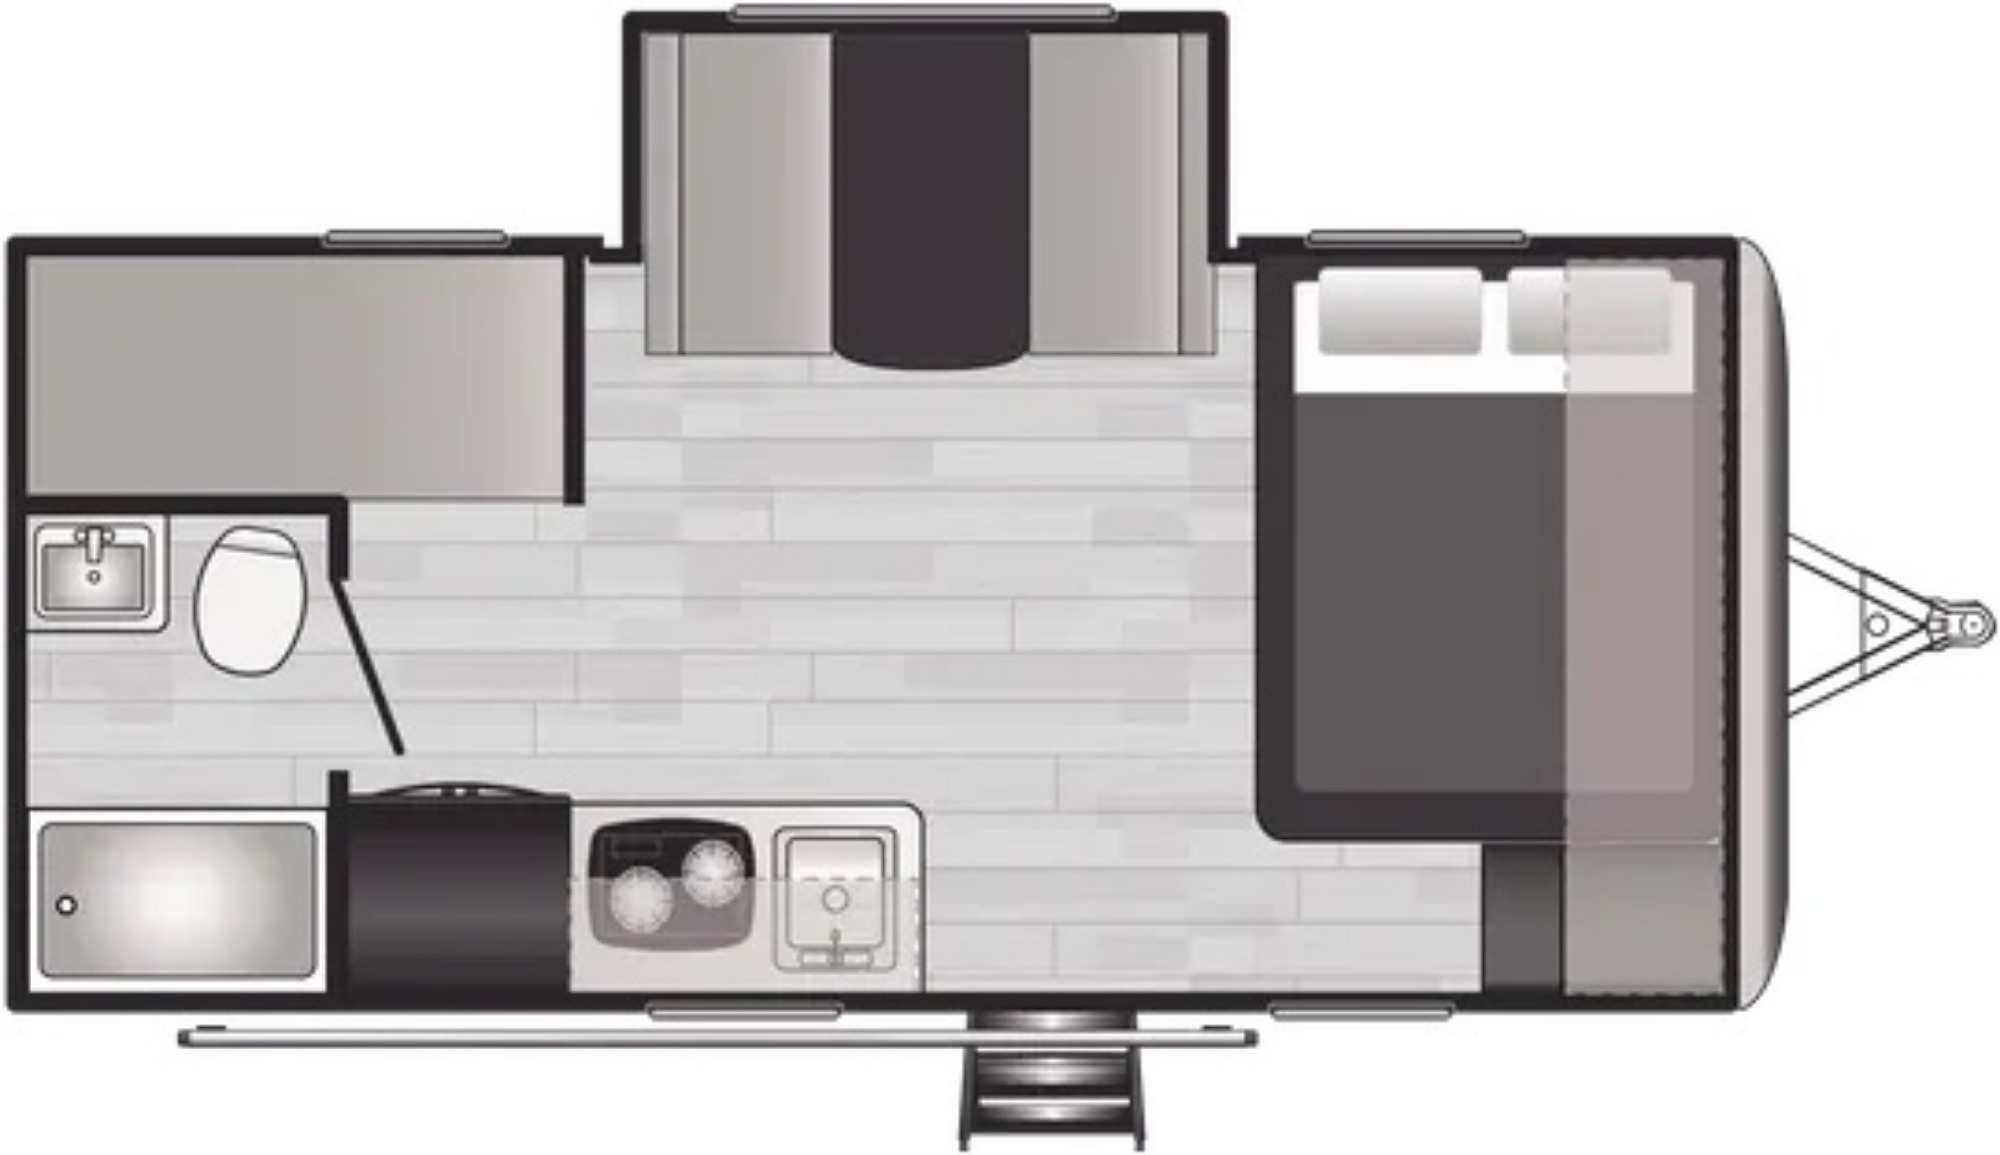 View Floor Plan for 2022 KEYSTONE SPRINGDALE 1760BH